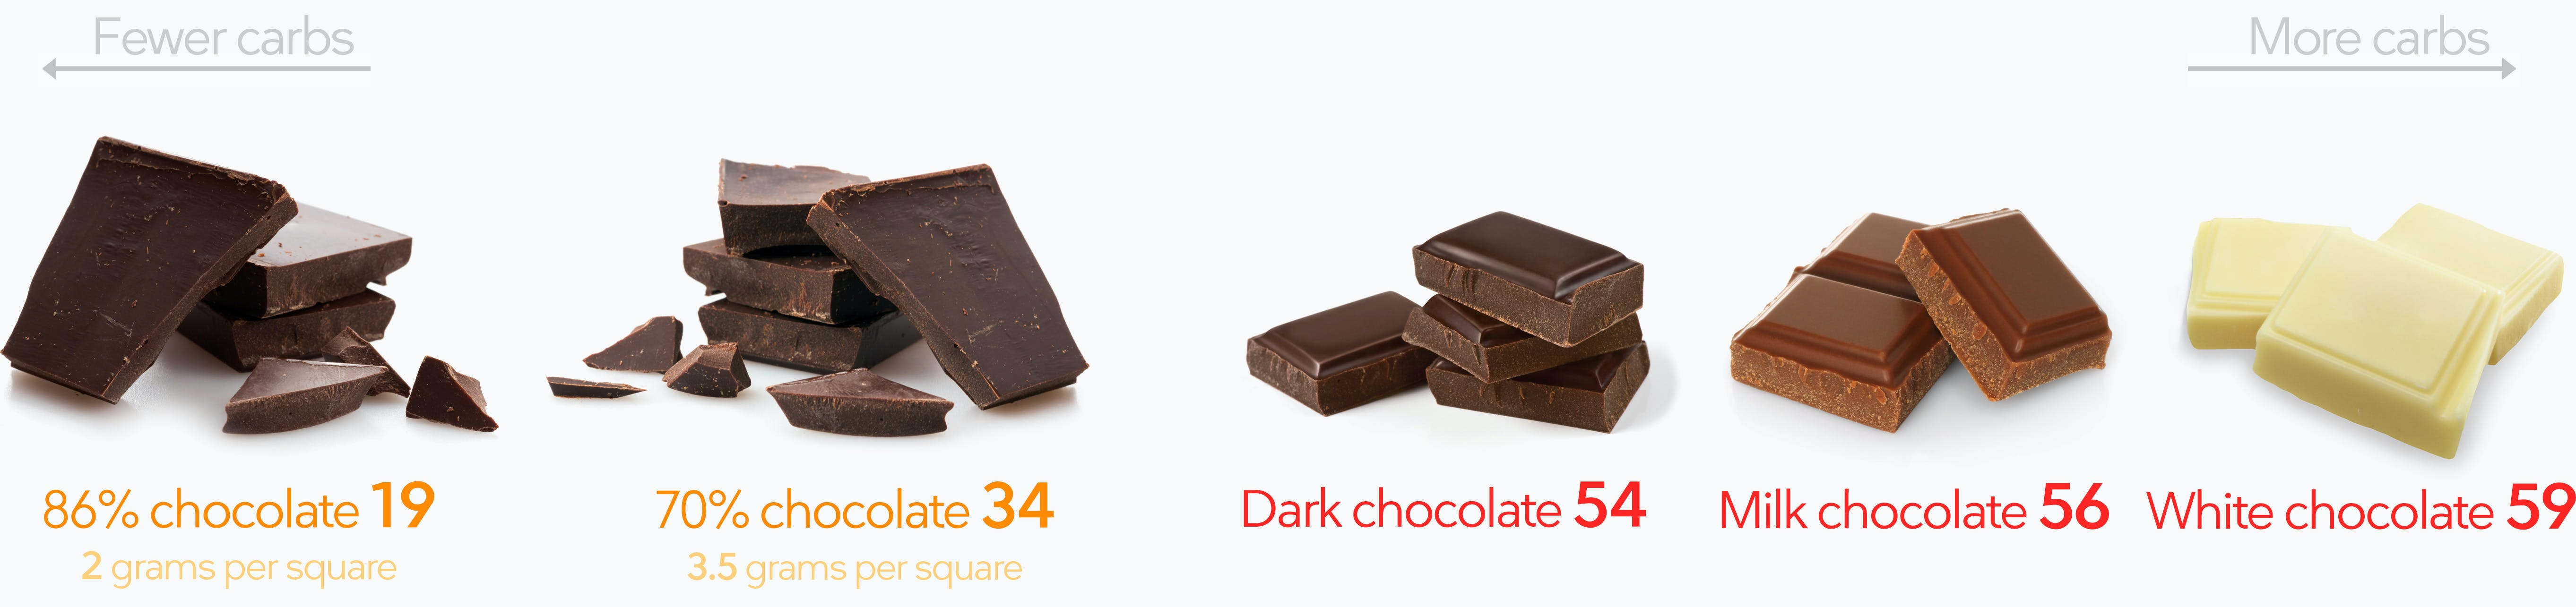 Keto chocolate snacks